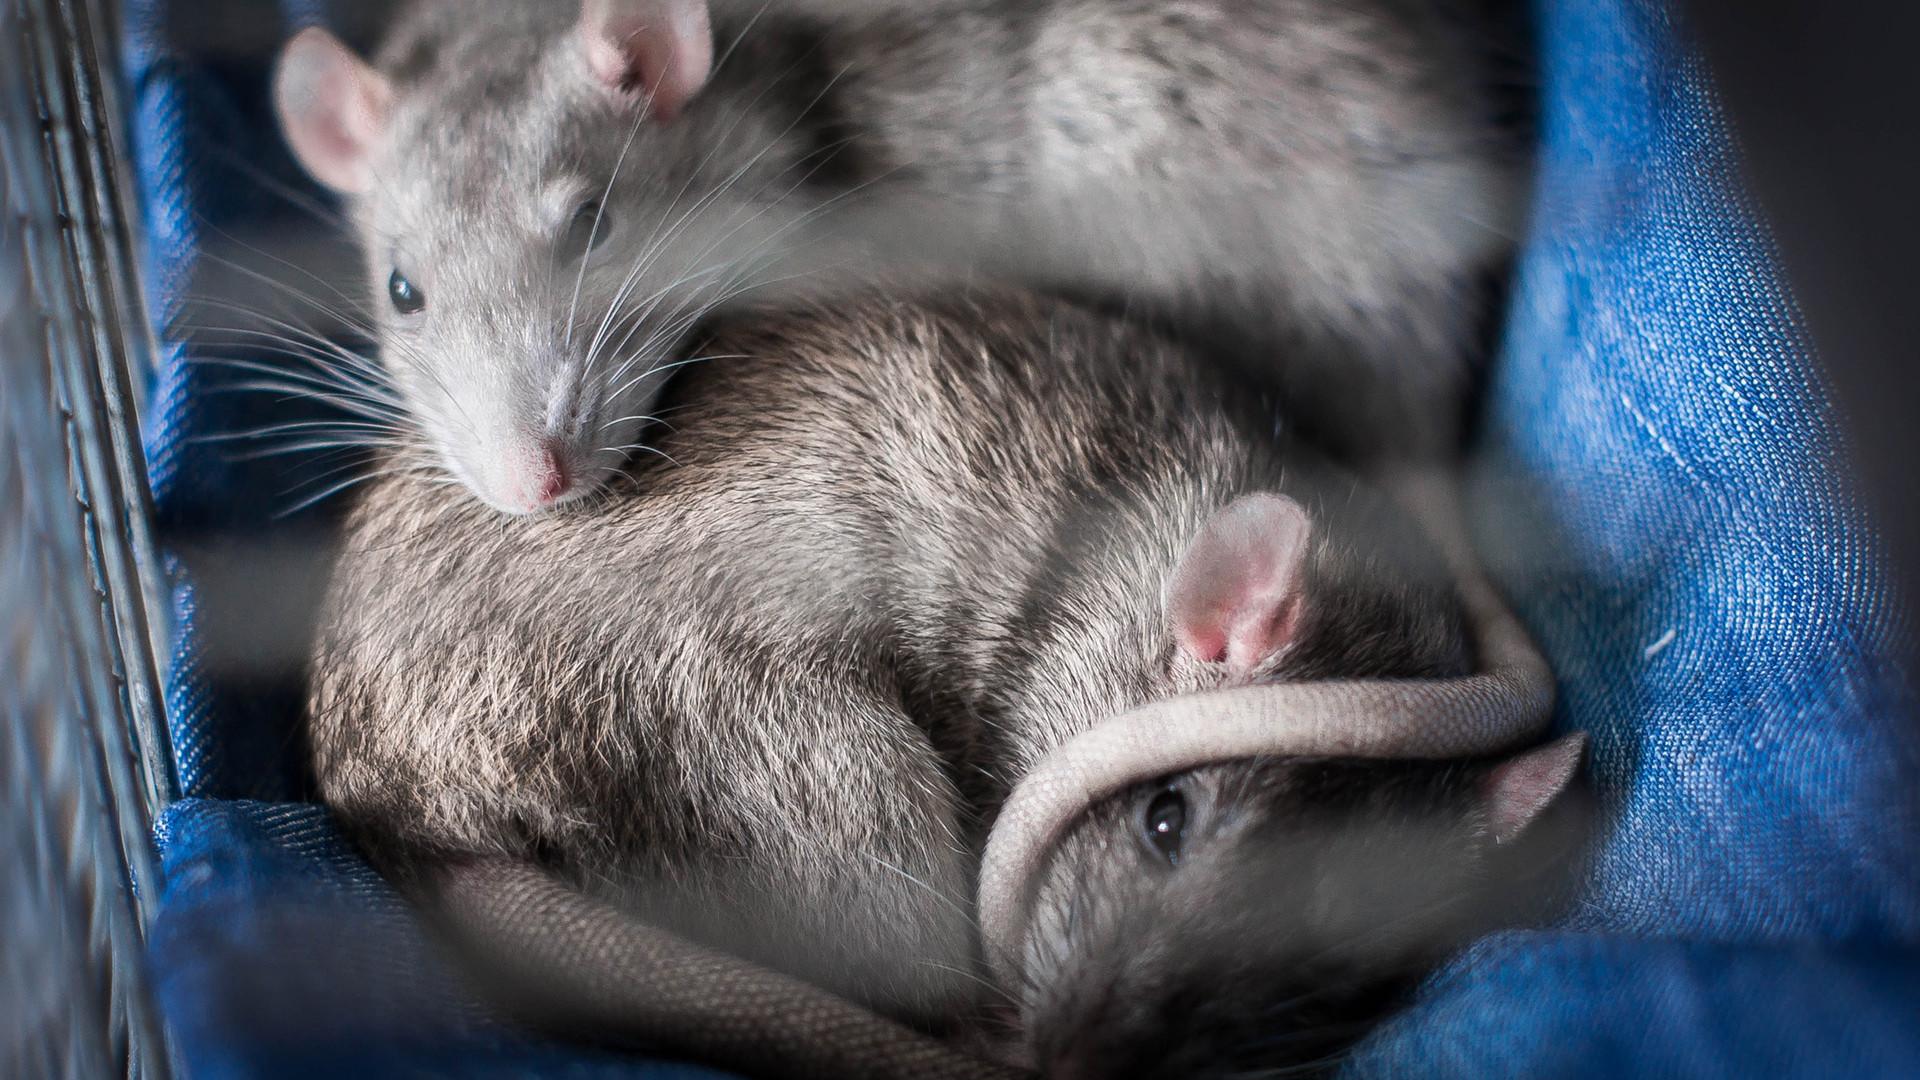 animals-asleep-cute-1051316.jpg